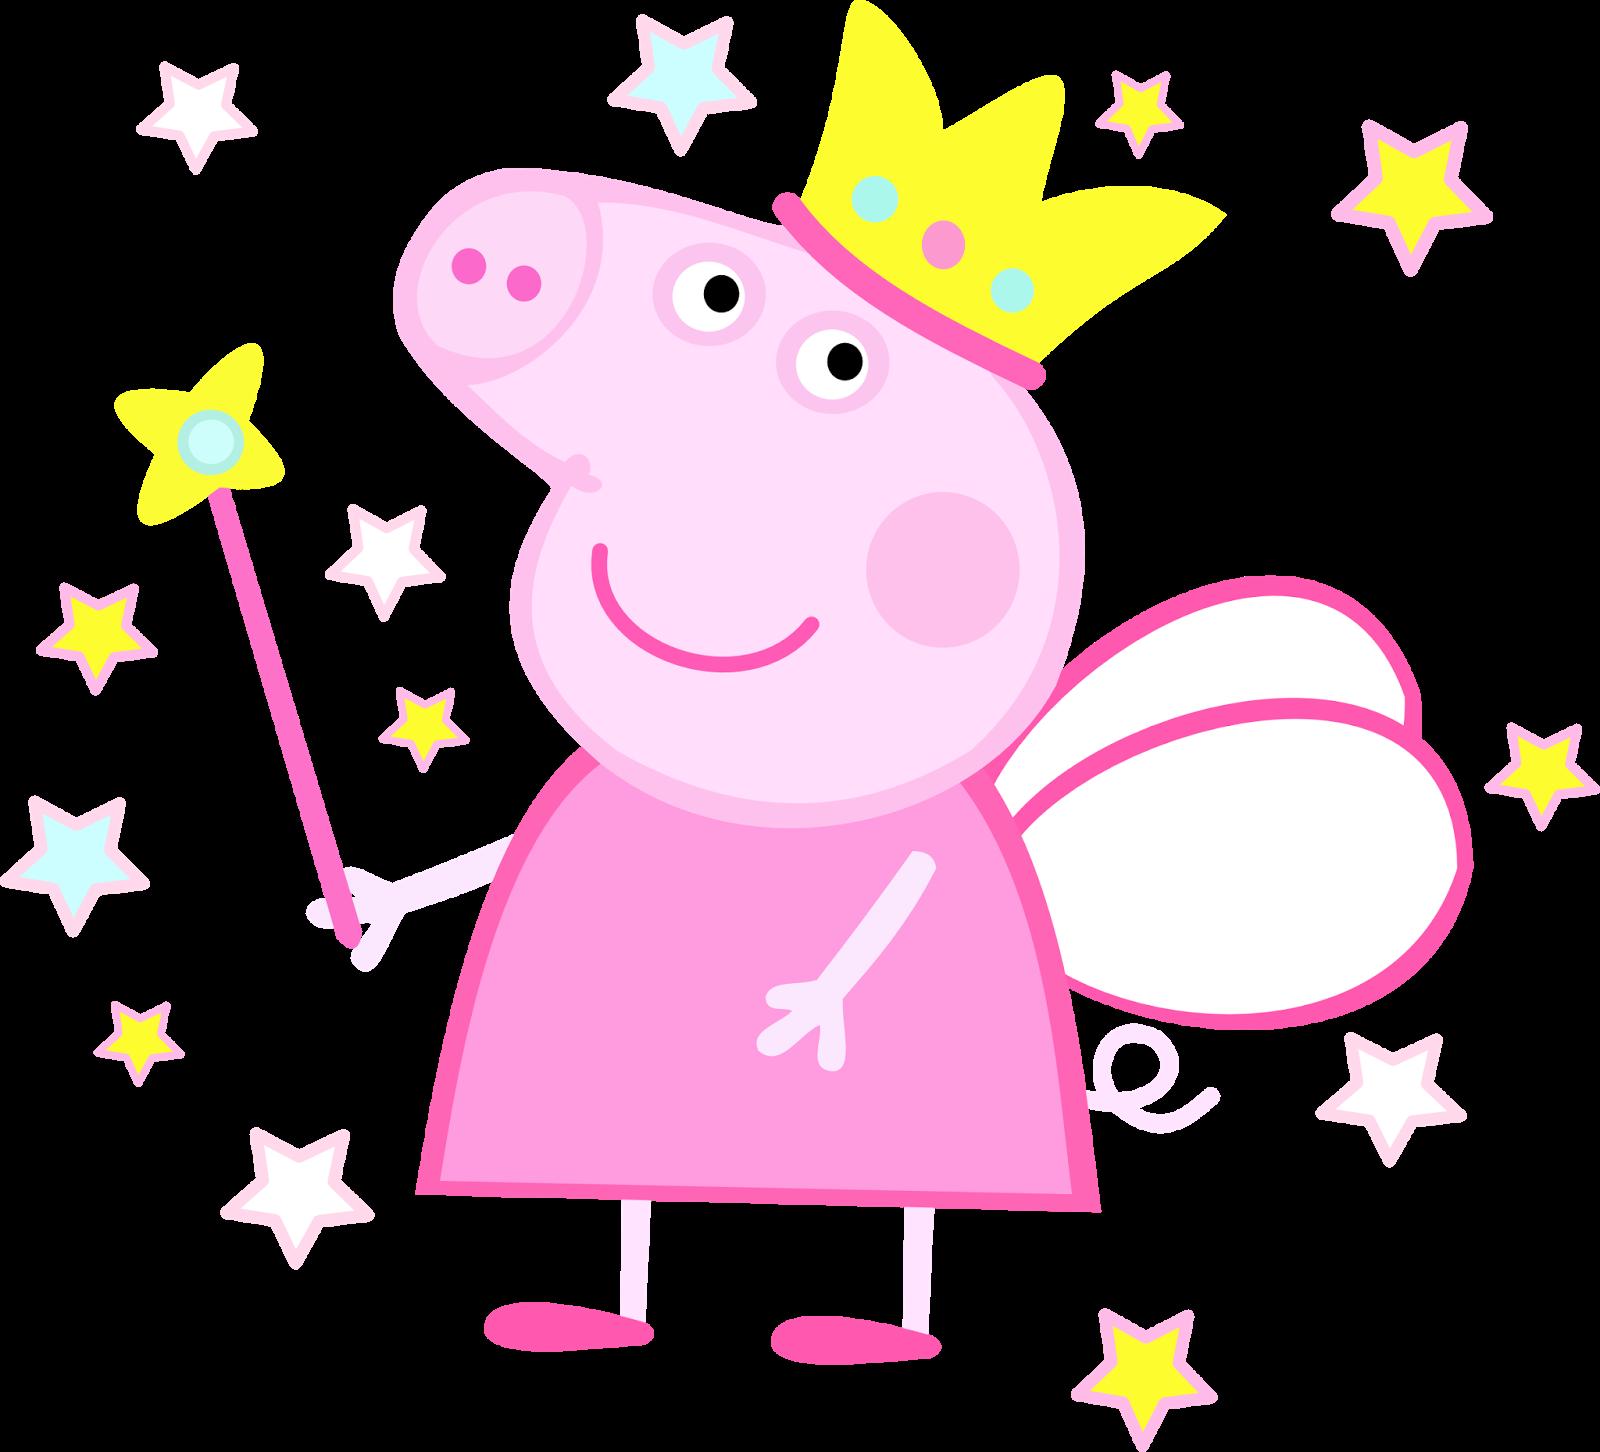 Peppa pig house clipart picture stock Montando a minha festa: Aprendendo a personalizar - Parte 4 | Ideas ... picture stock